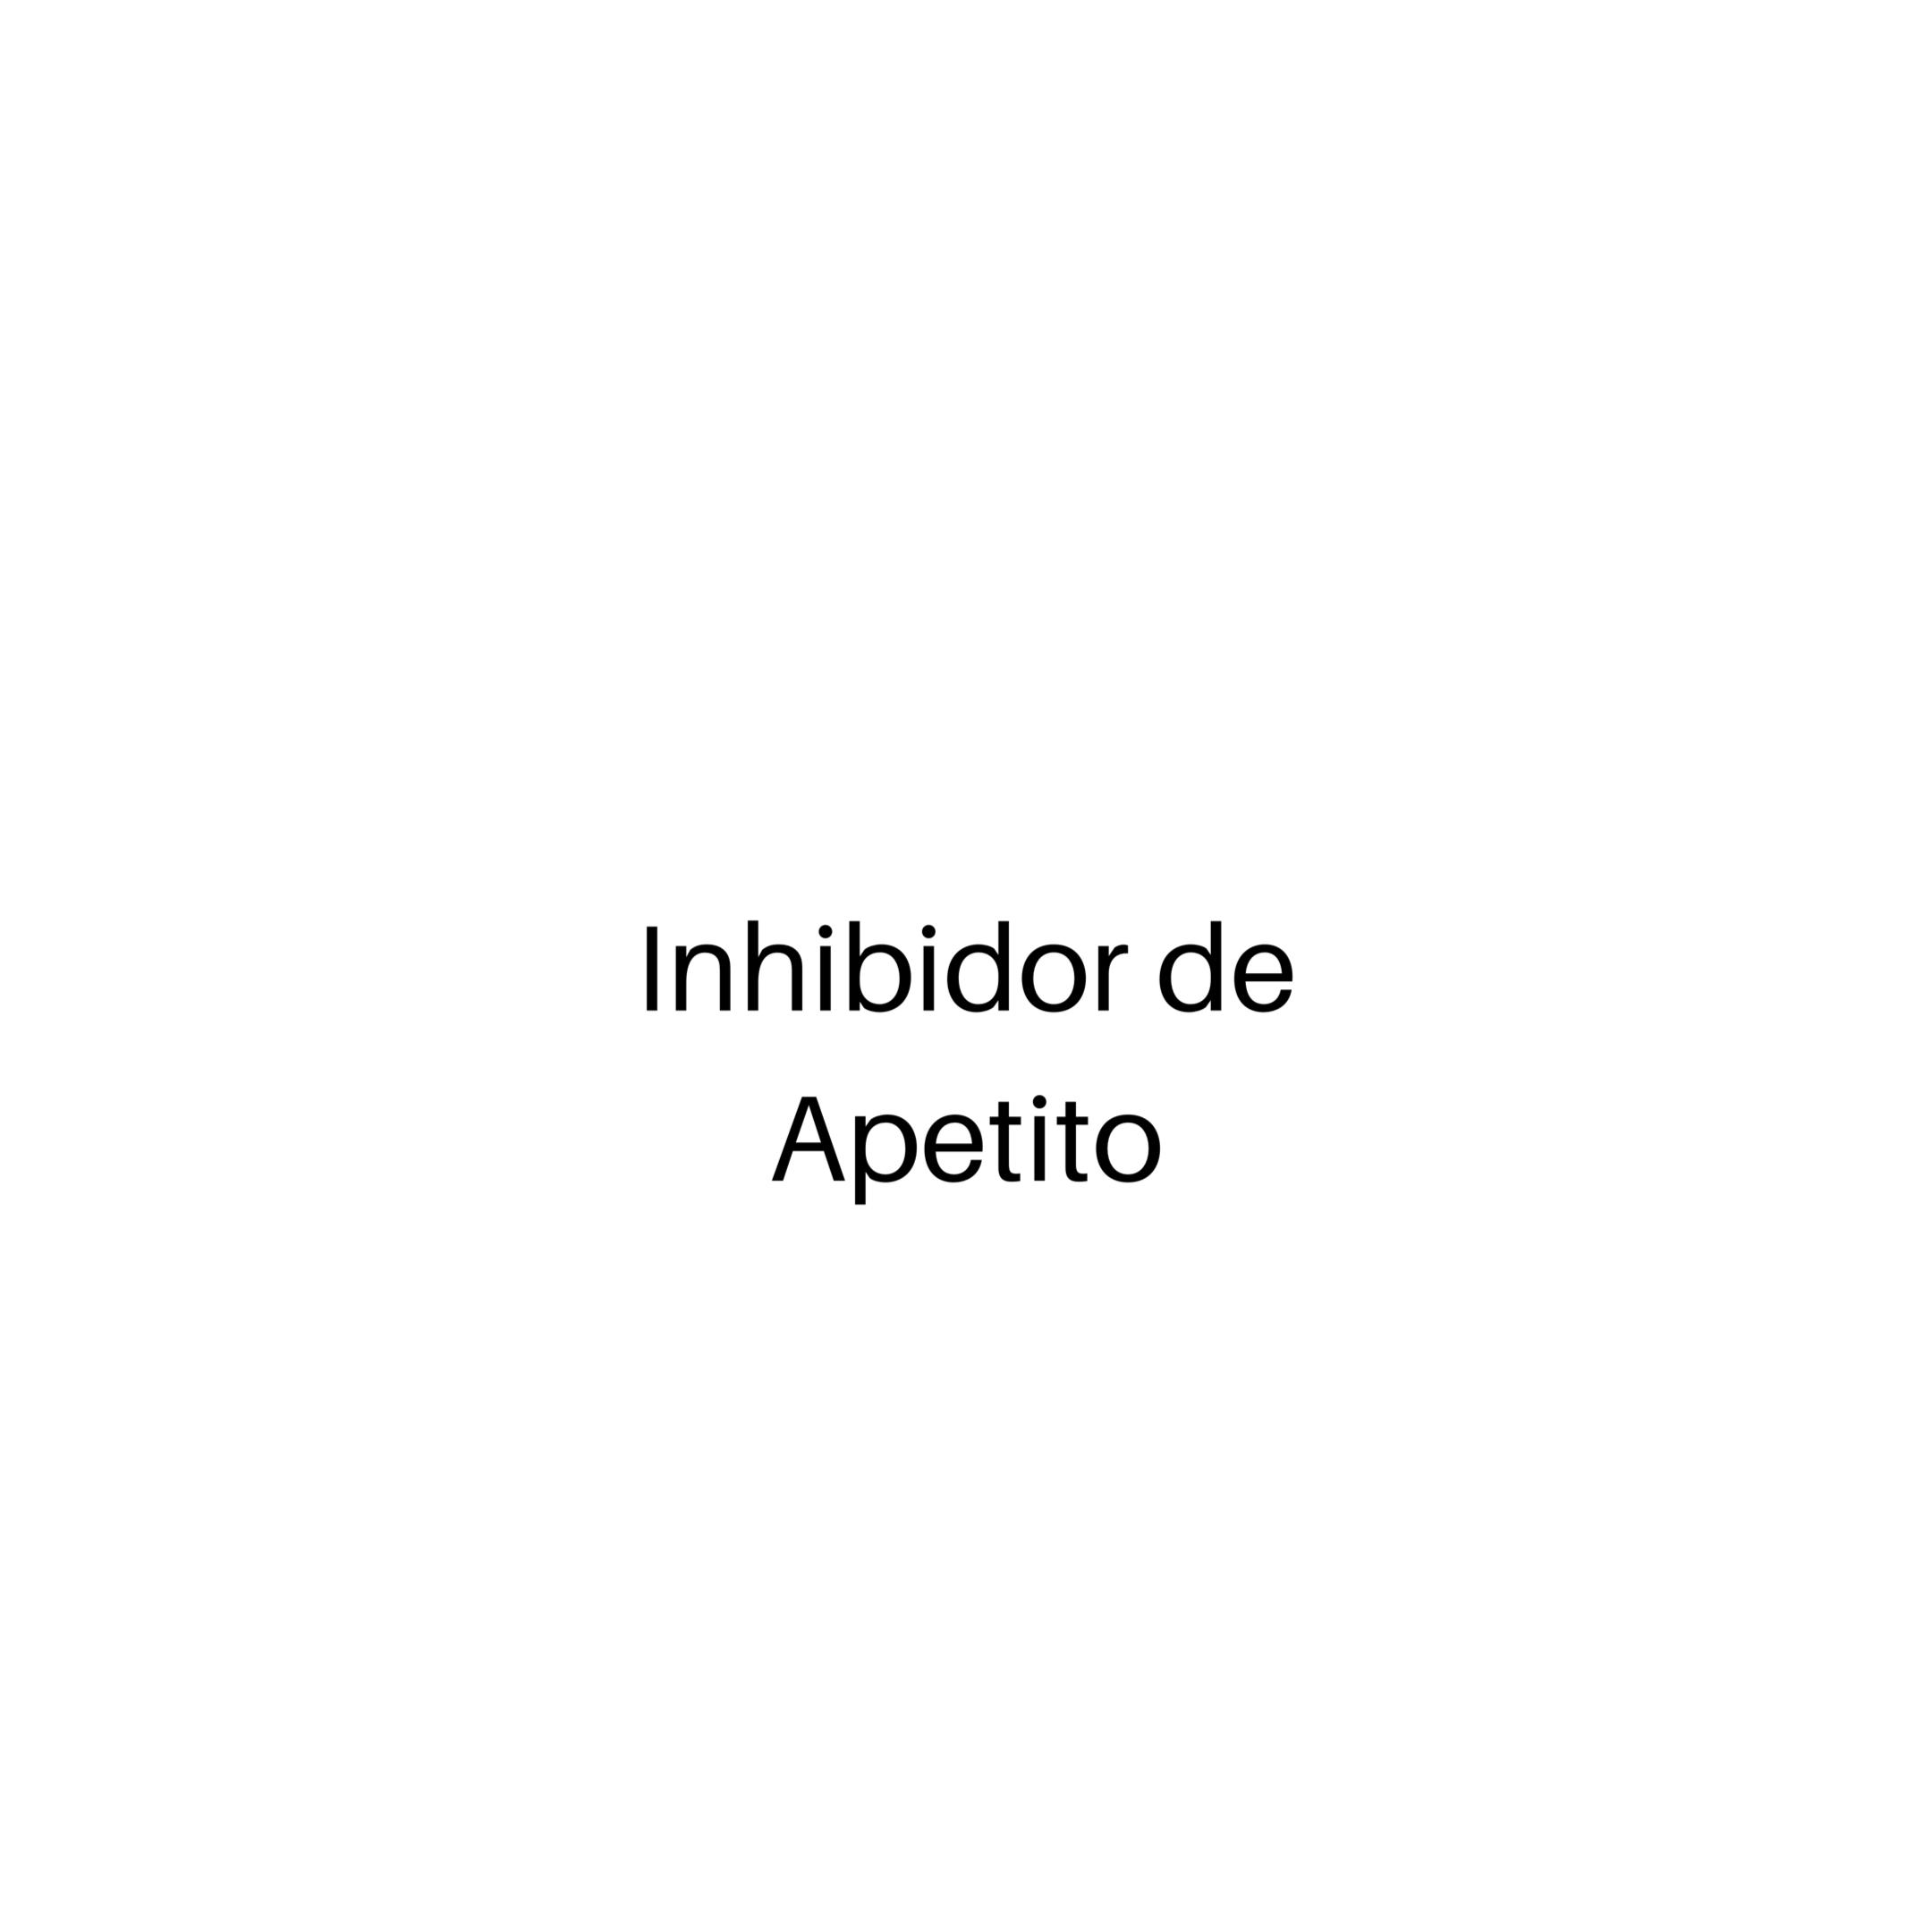 INHIBE EL APETITO